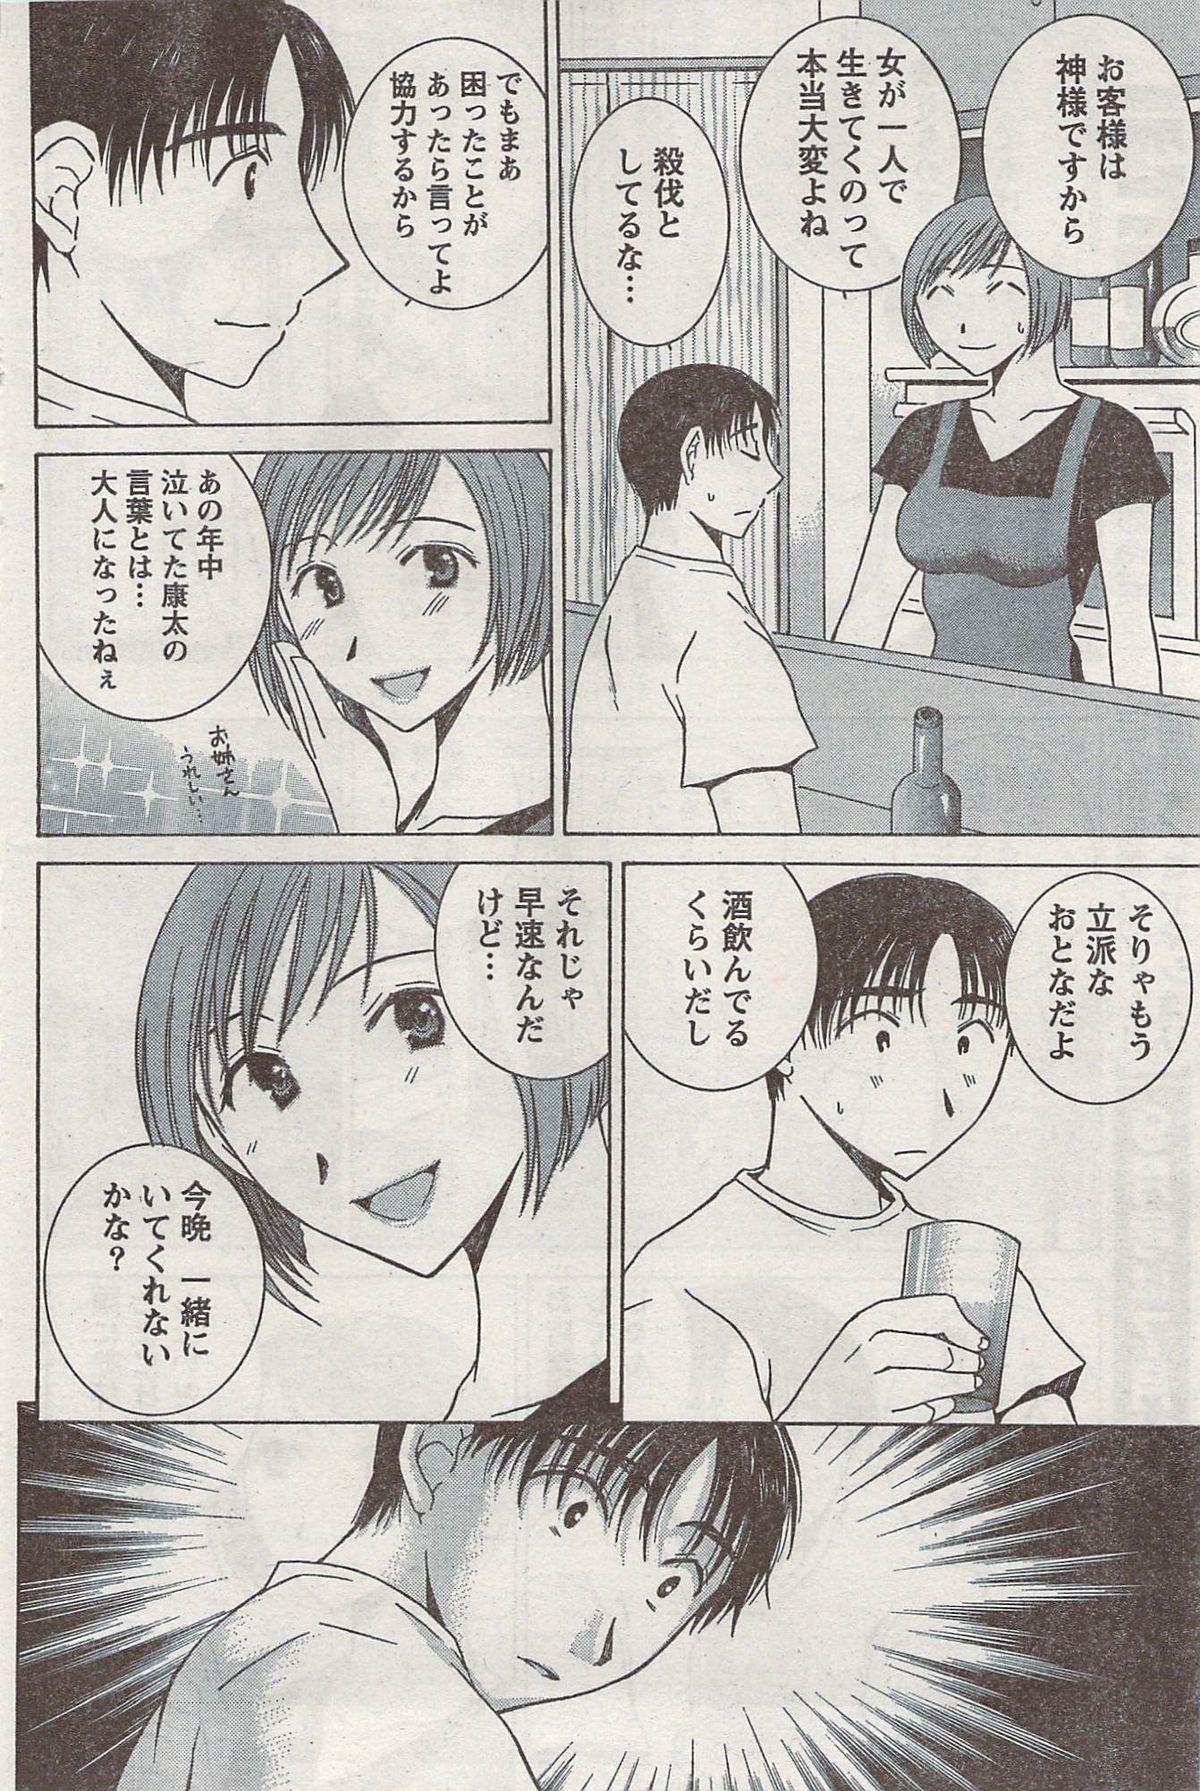 Monthly Vitaman 2007-08 99